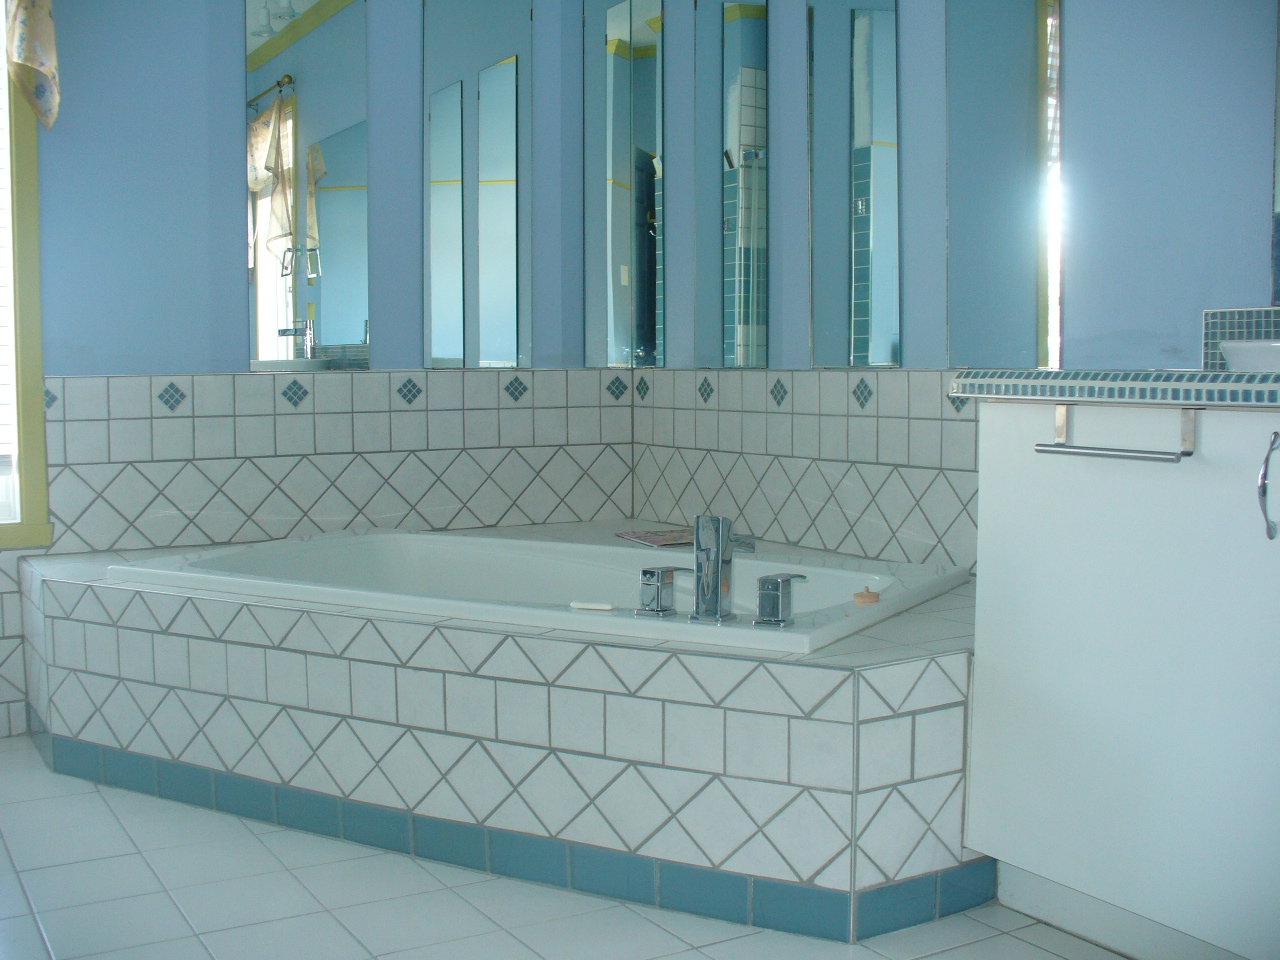 Carrelage douche salle de bain - Salle de bain ceramique photo ...